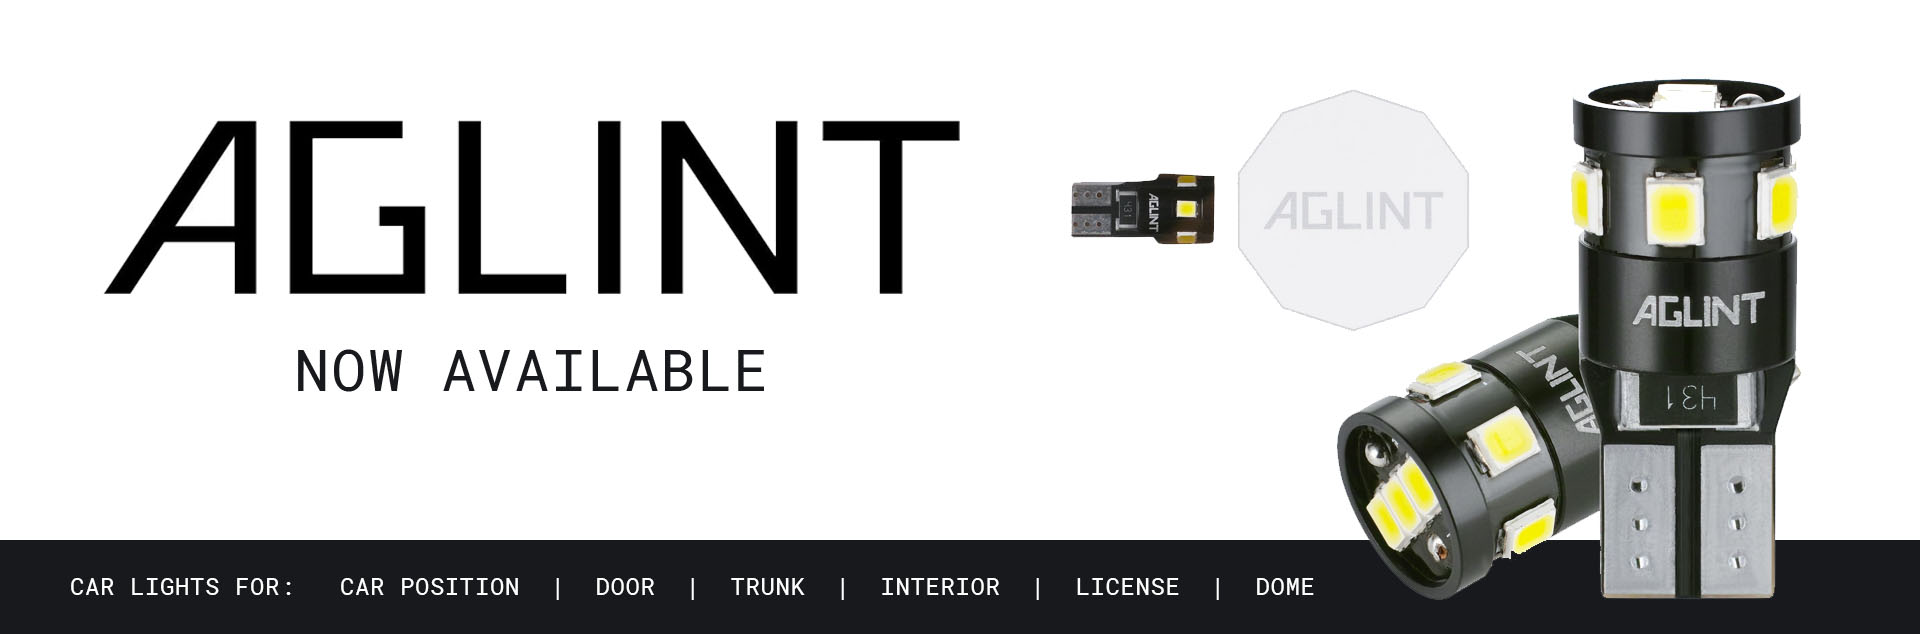 Aglint Web Banner Autonorte